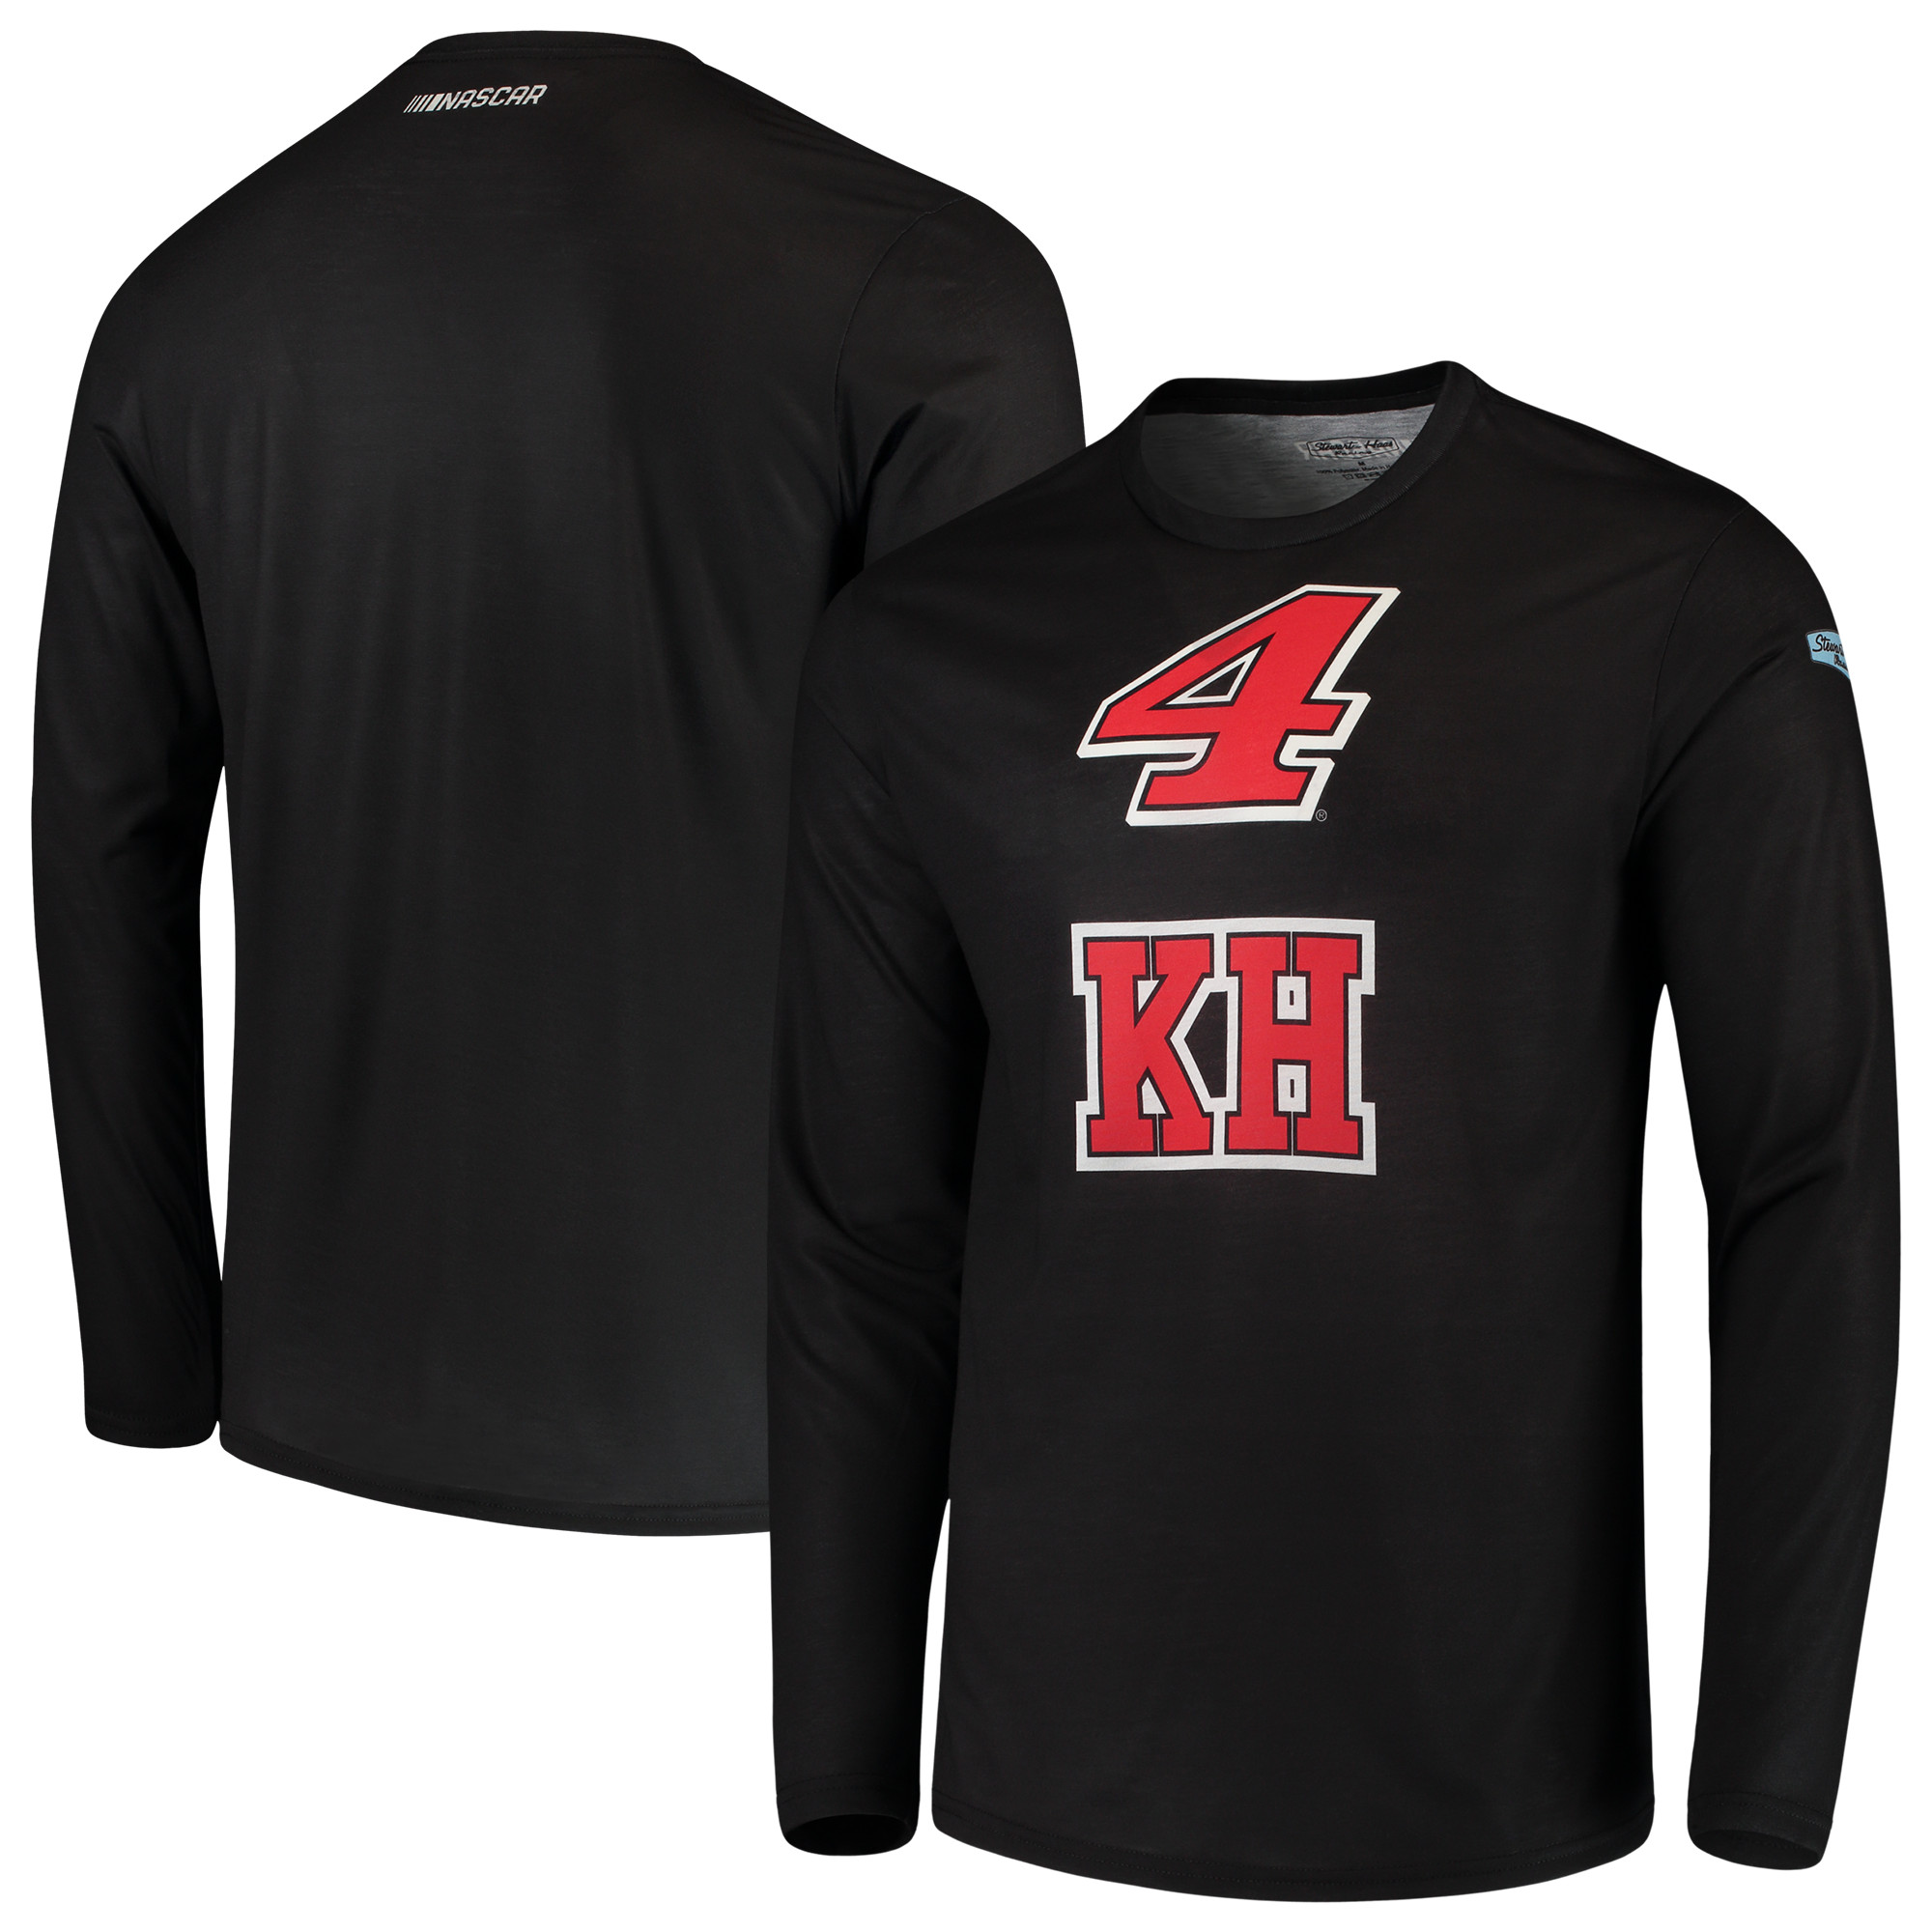 Kevin Harvick Sublimated Long Sleeve T-Shirt - Black